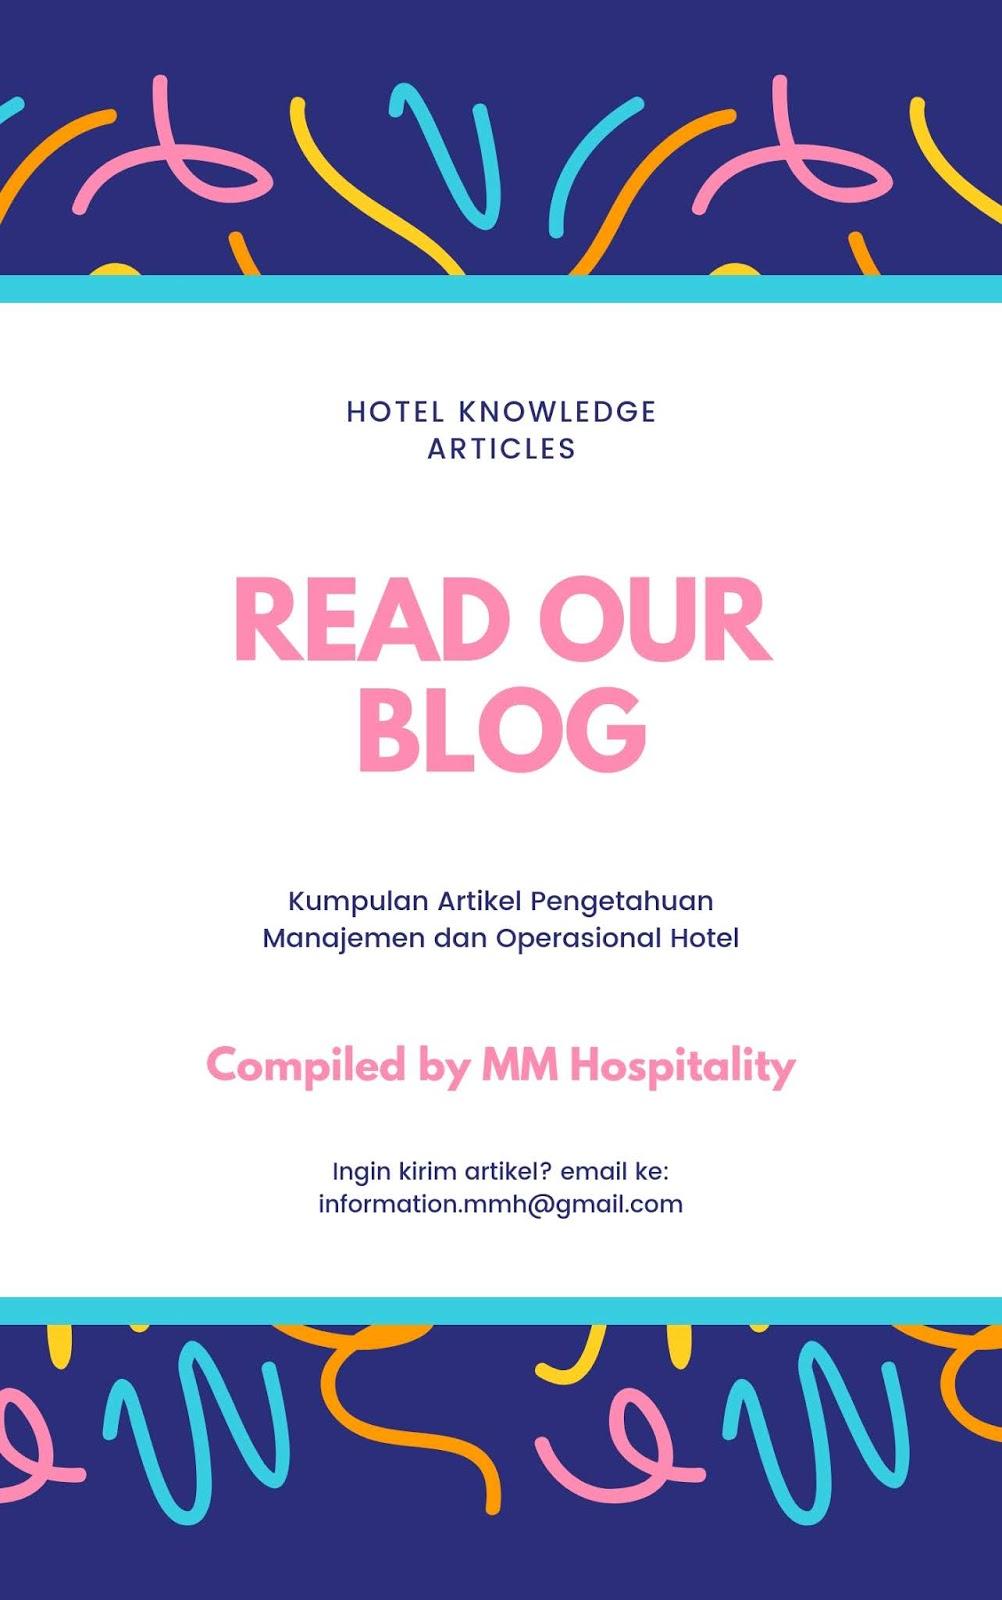 MM Hospitality: November 2017